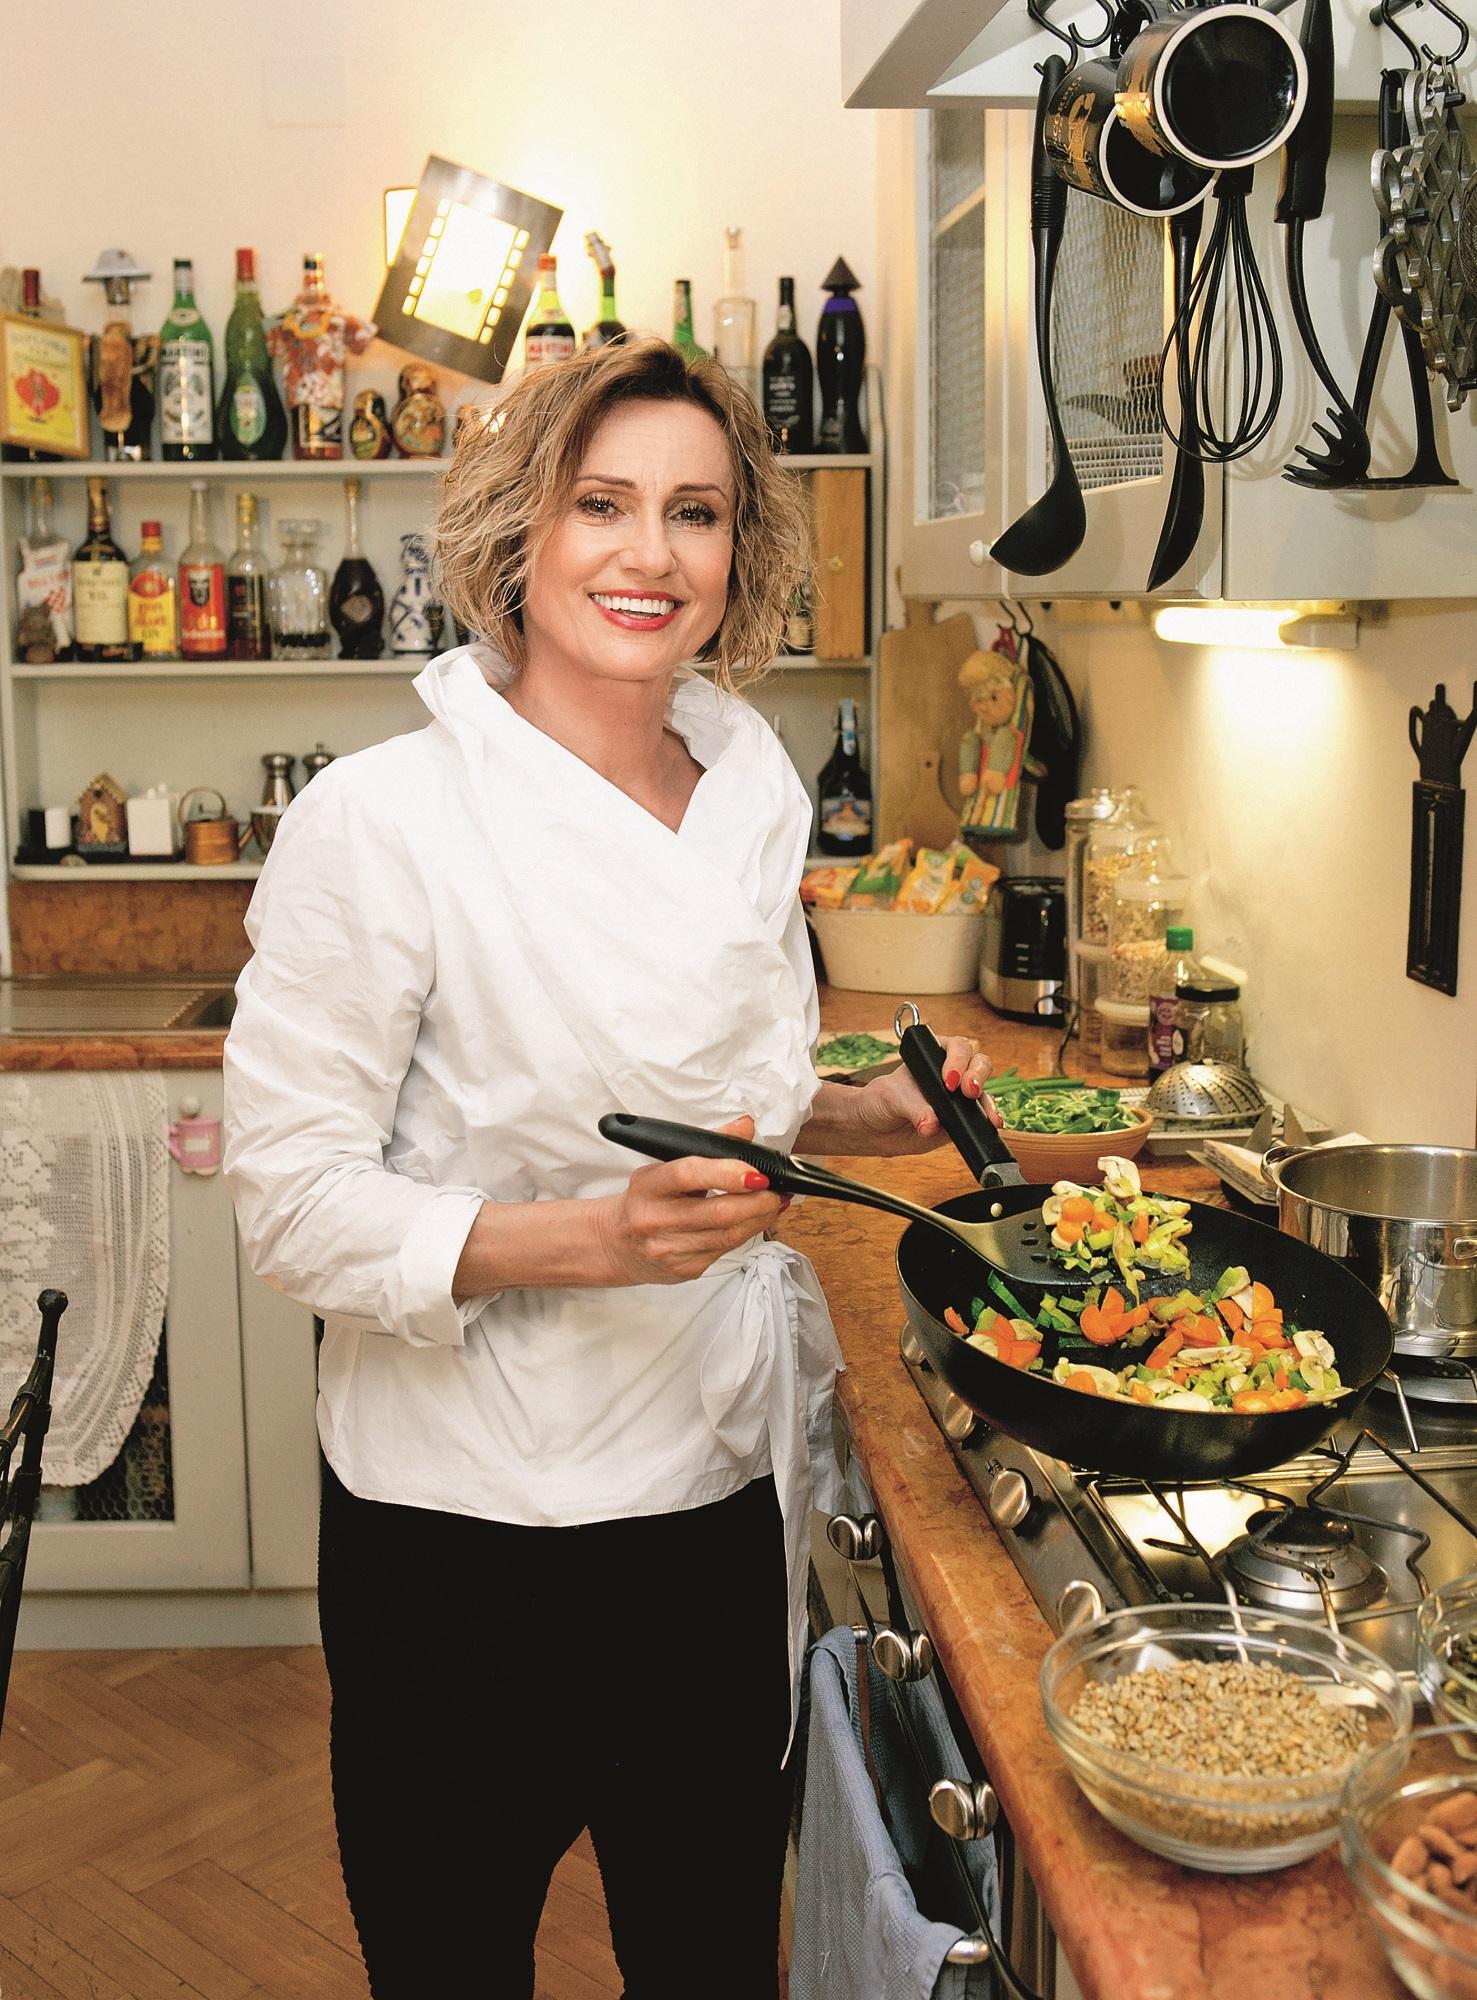 almira osmanovic za rubriku kuhinja, zagreb, 090420, zagreb foto ines stipetic